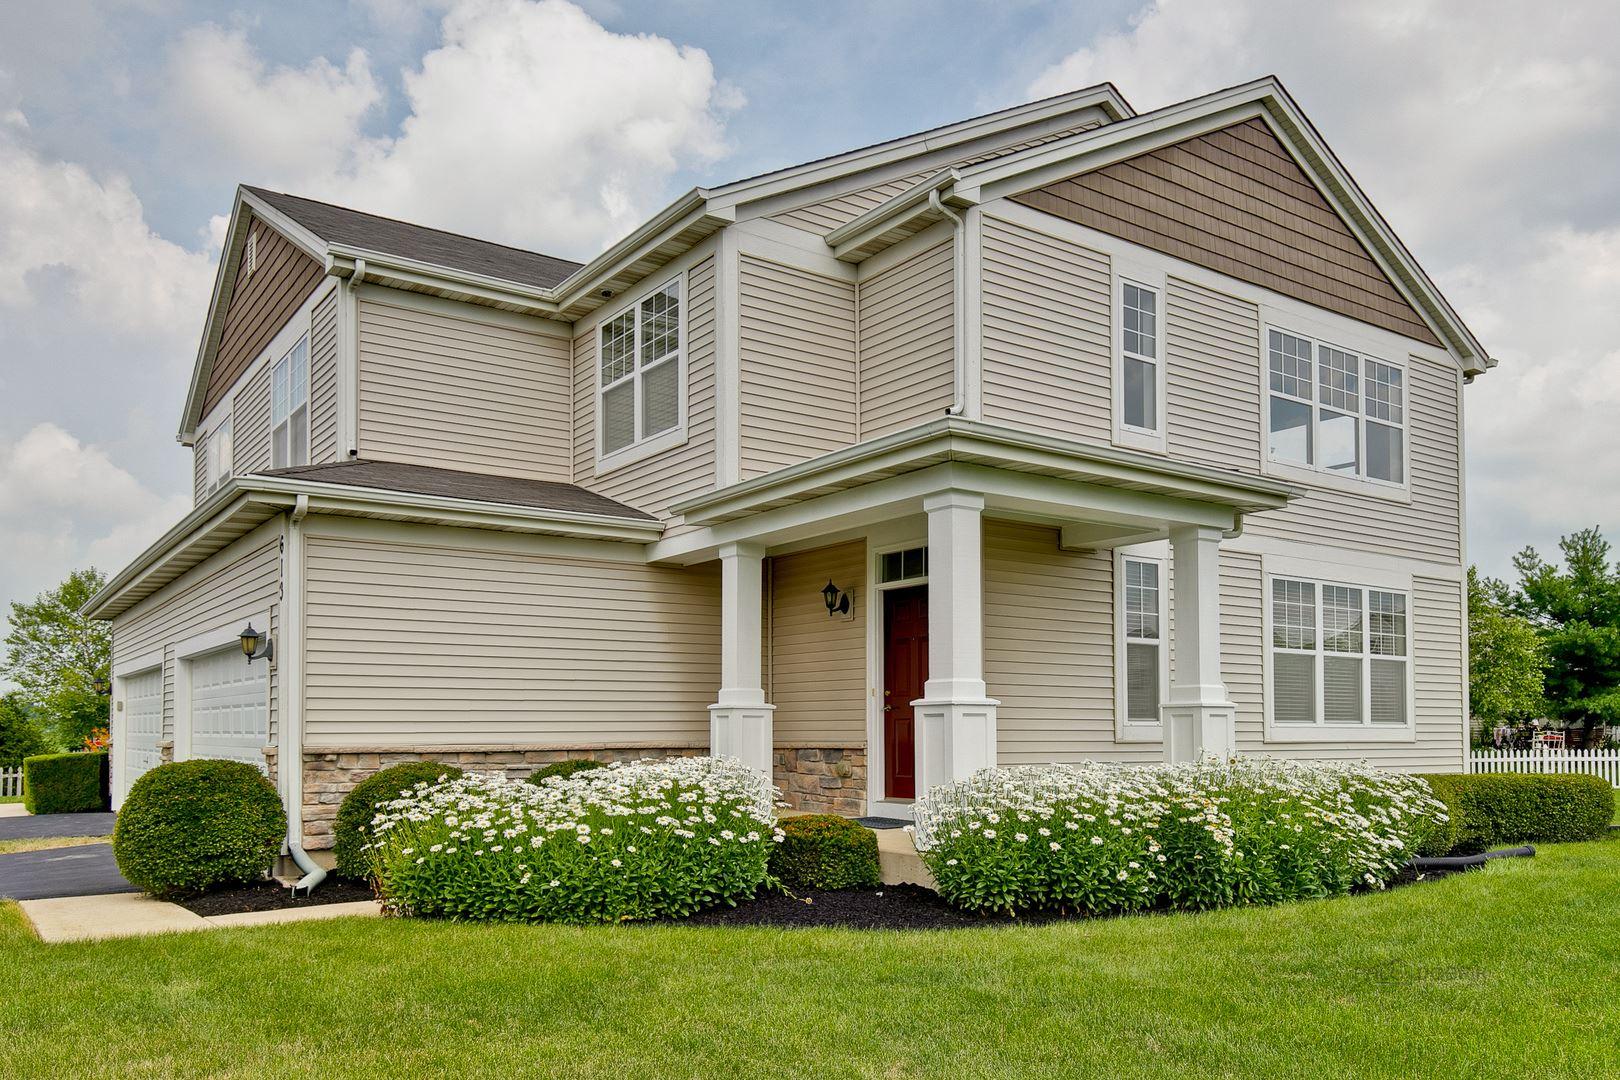 613 Schubert Street, Woodstock, IL 60098 - #: 10778161